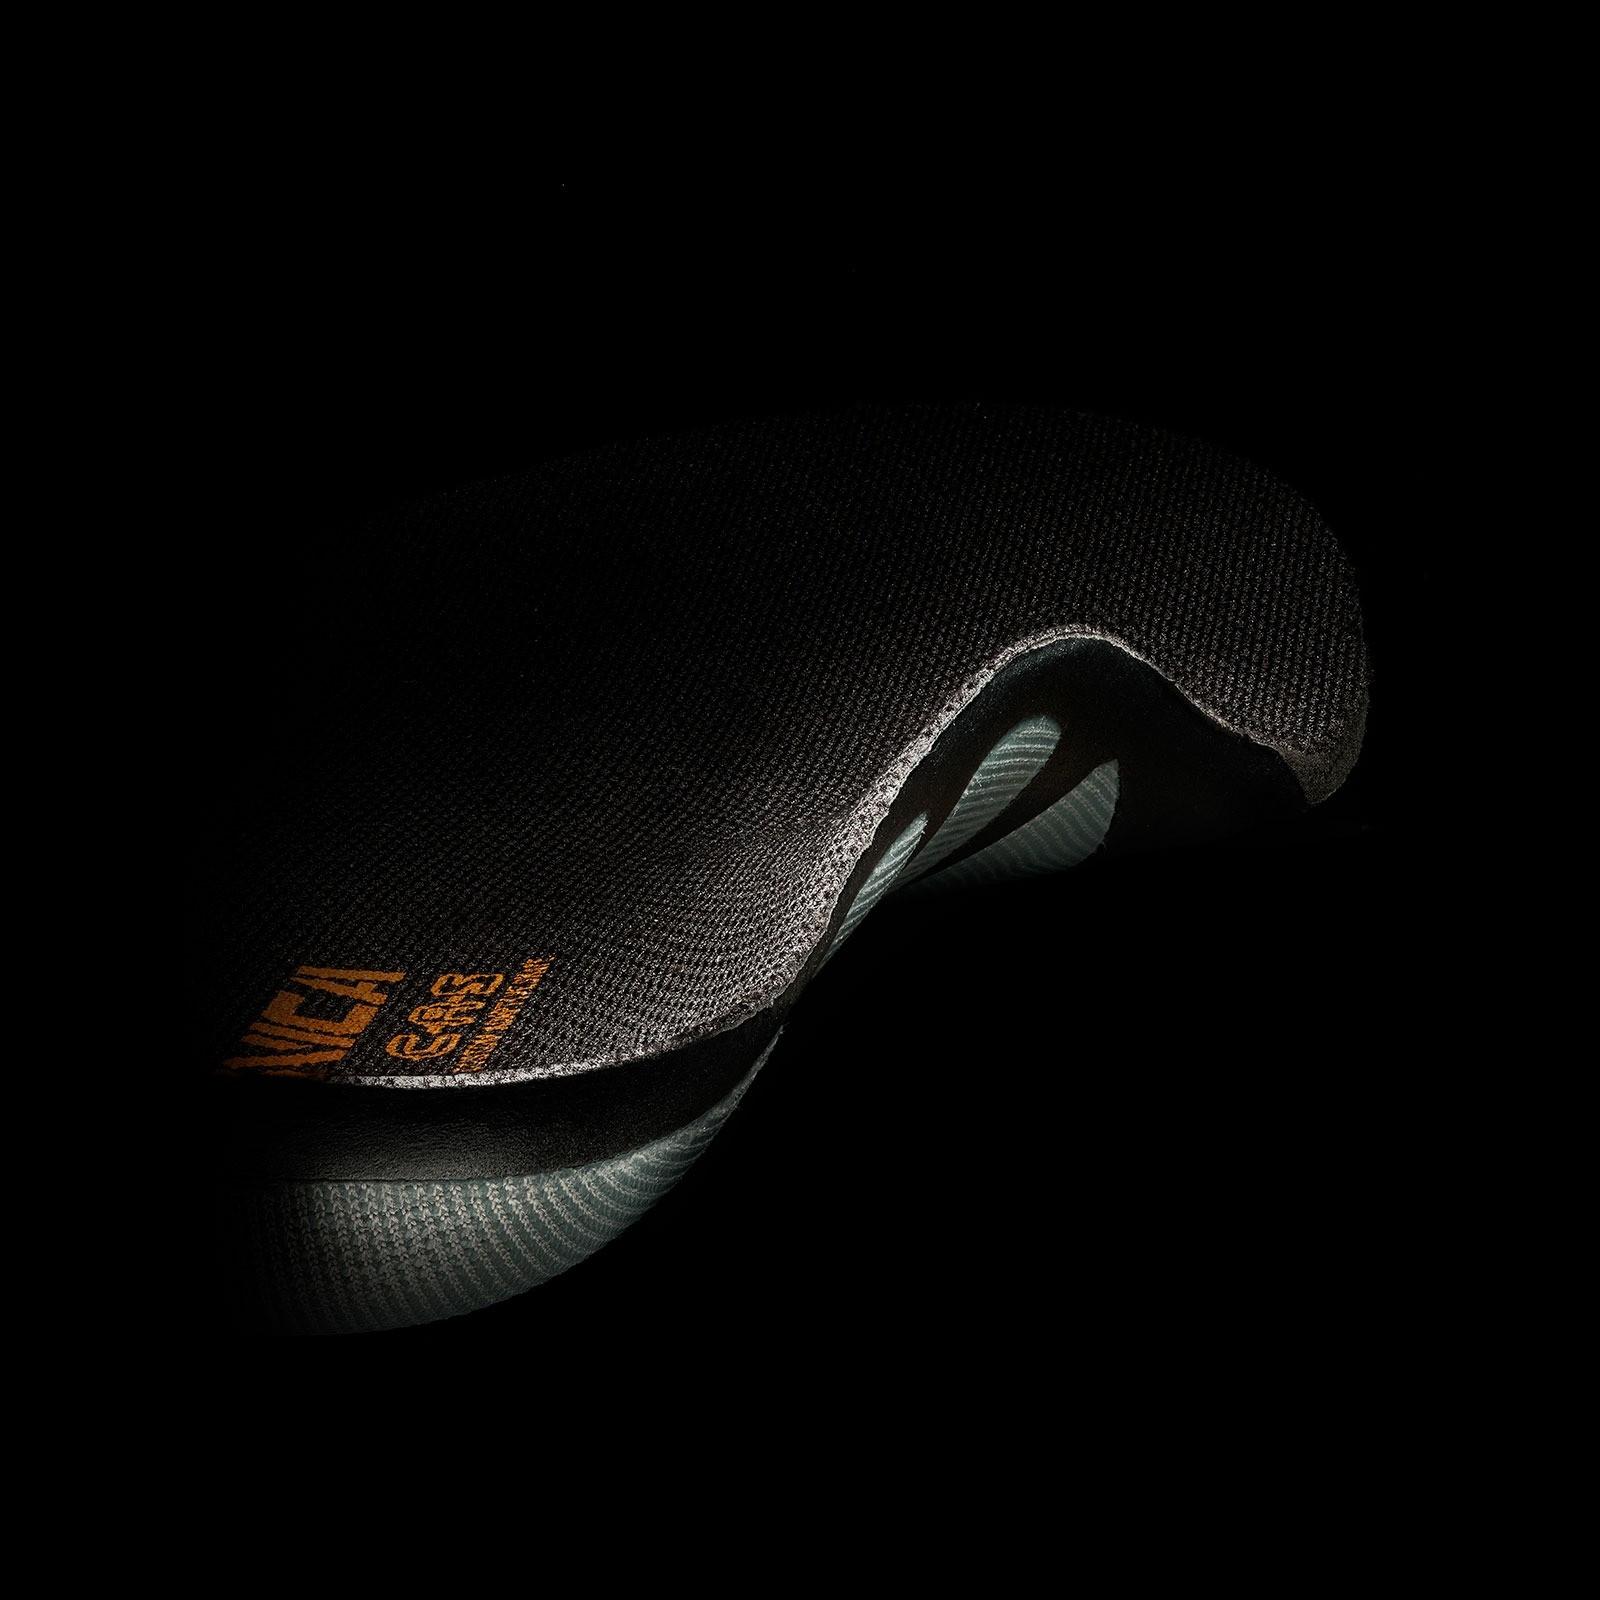 Midfoot support - Origin LD